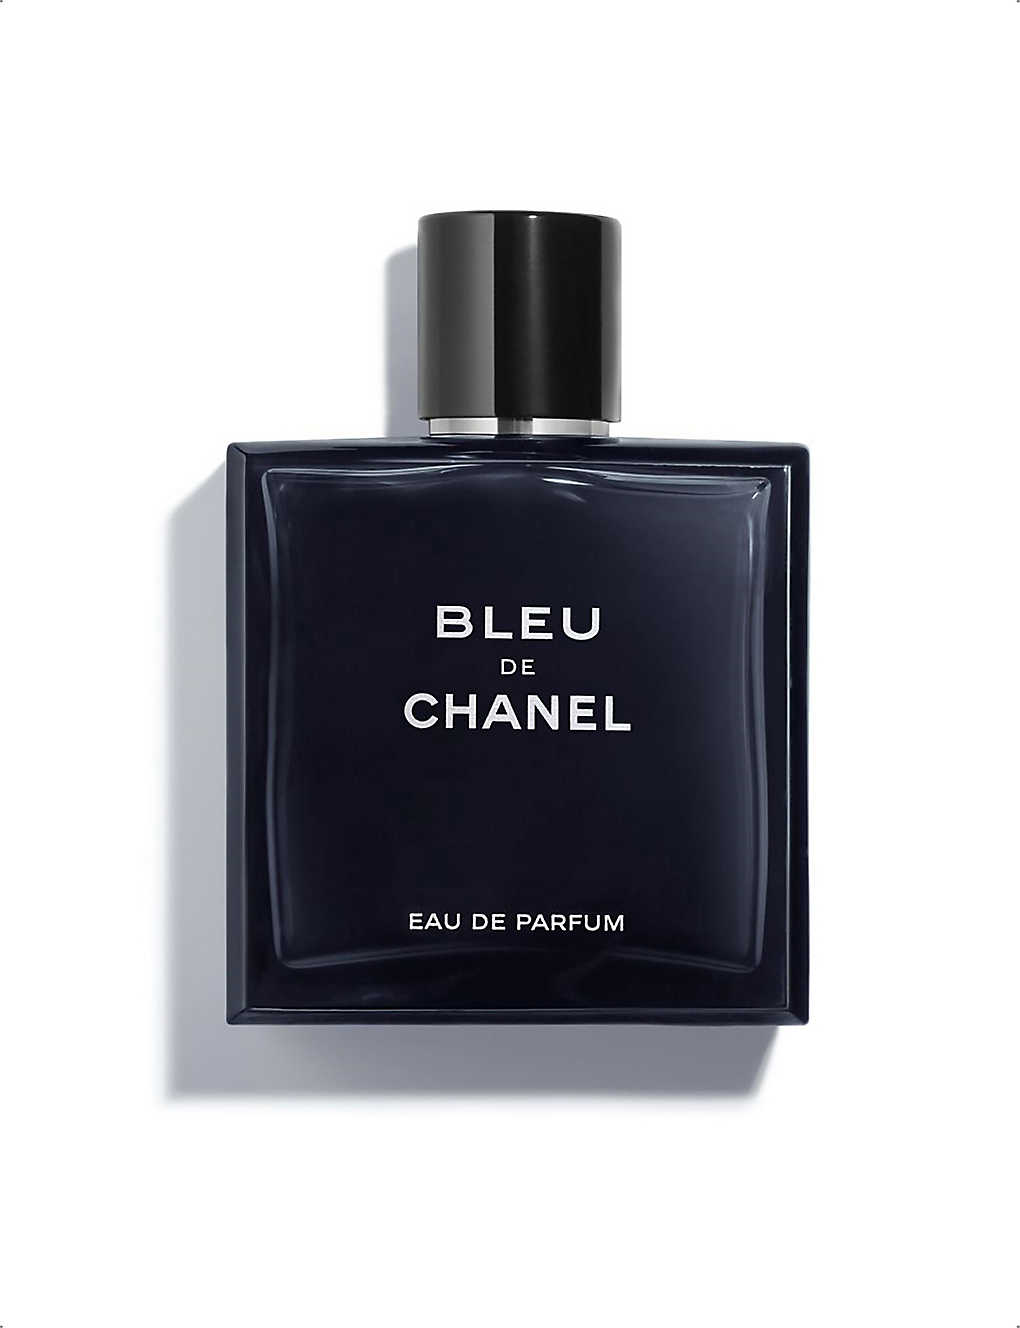 Chanel Bleu De Chanel Eau De Parfum 150ml Selfridgescom